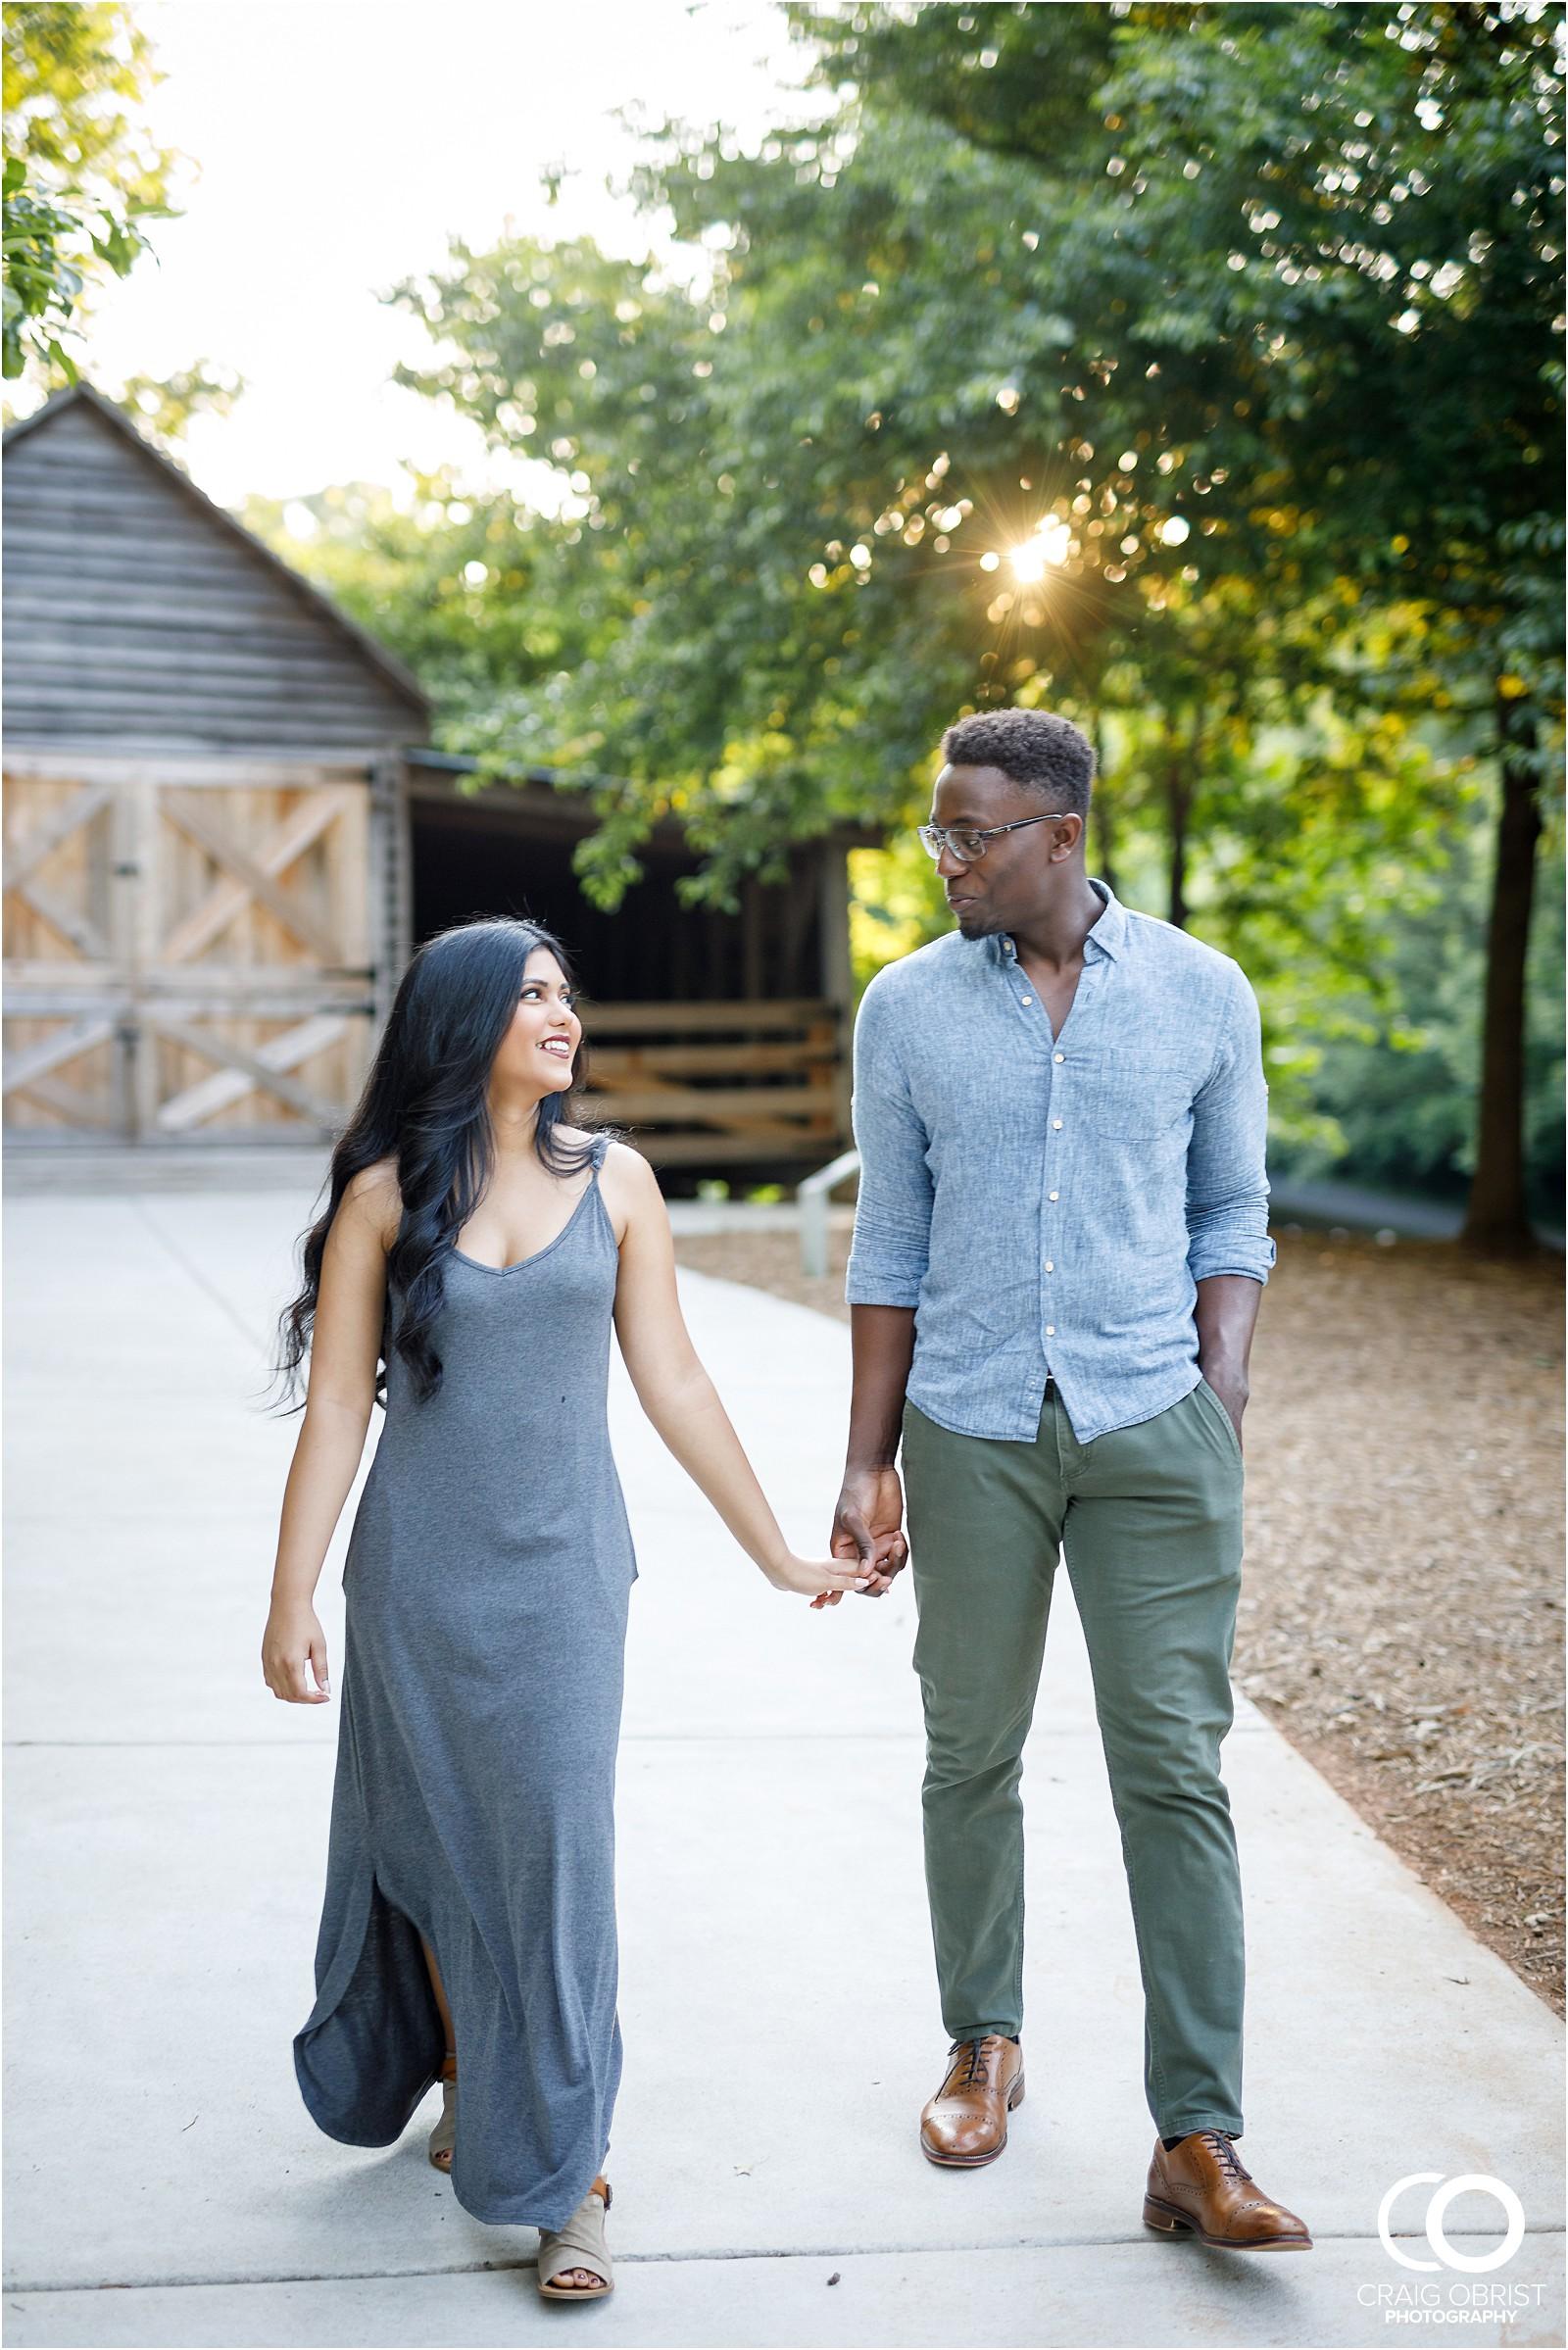 Downtown Duluth Mcdaniel Farm Park Post Wedding Portraits Atlanta_0008.jpg